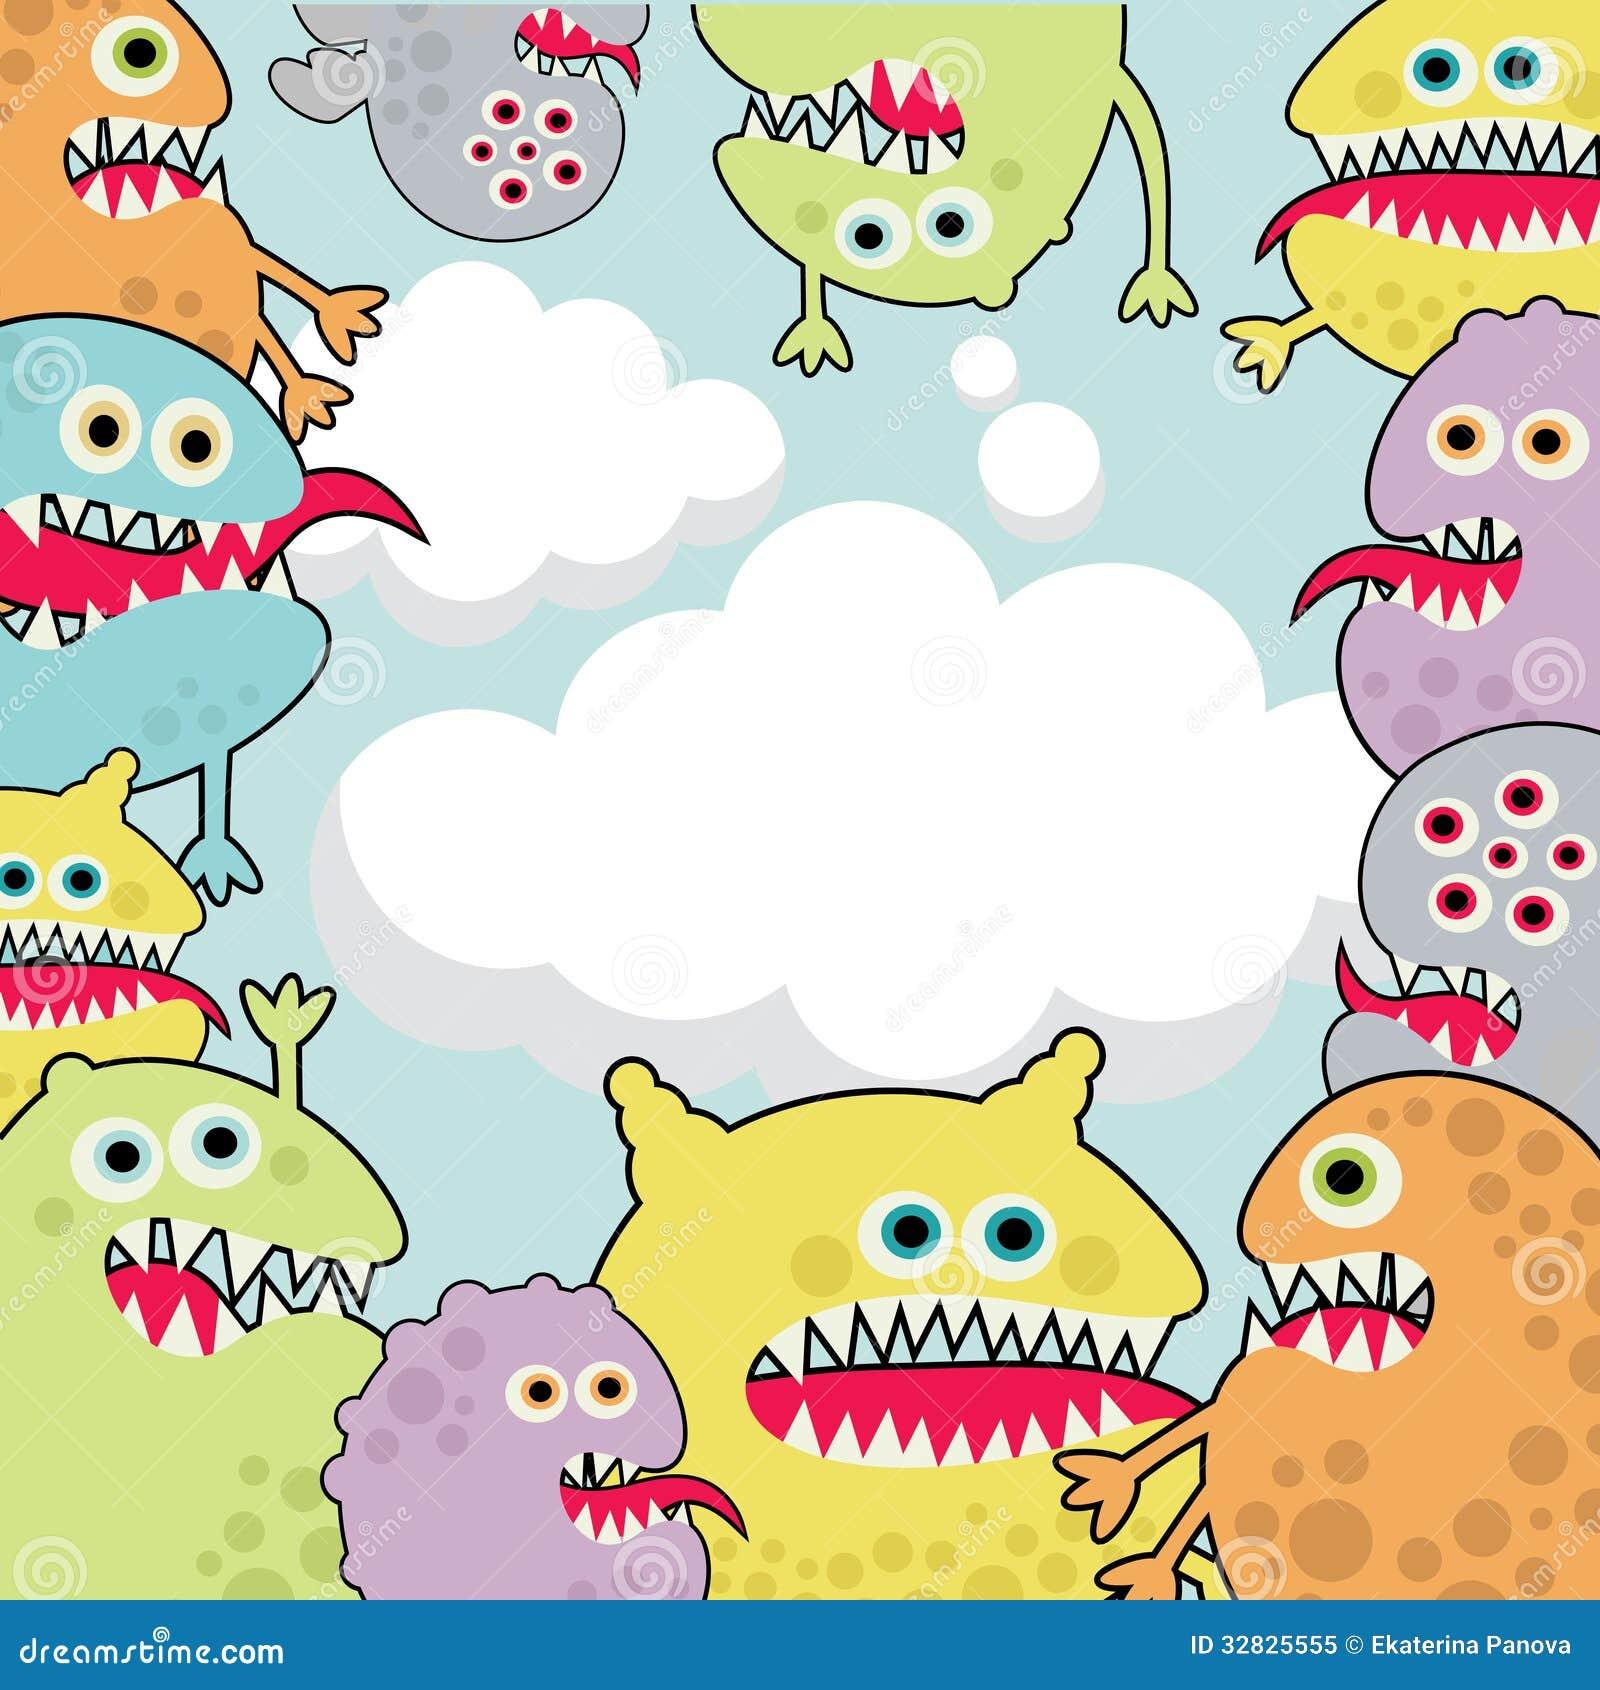 Cute monsters banner cloud shape.